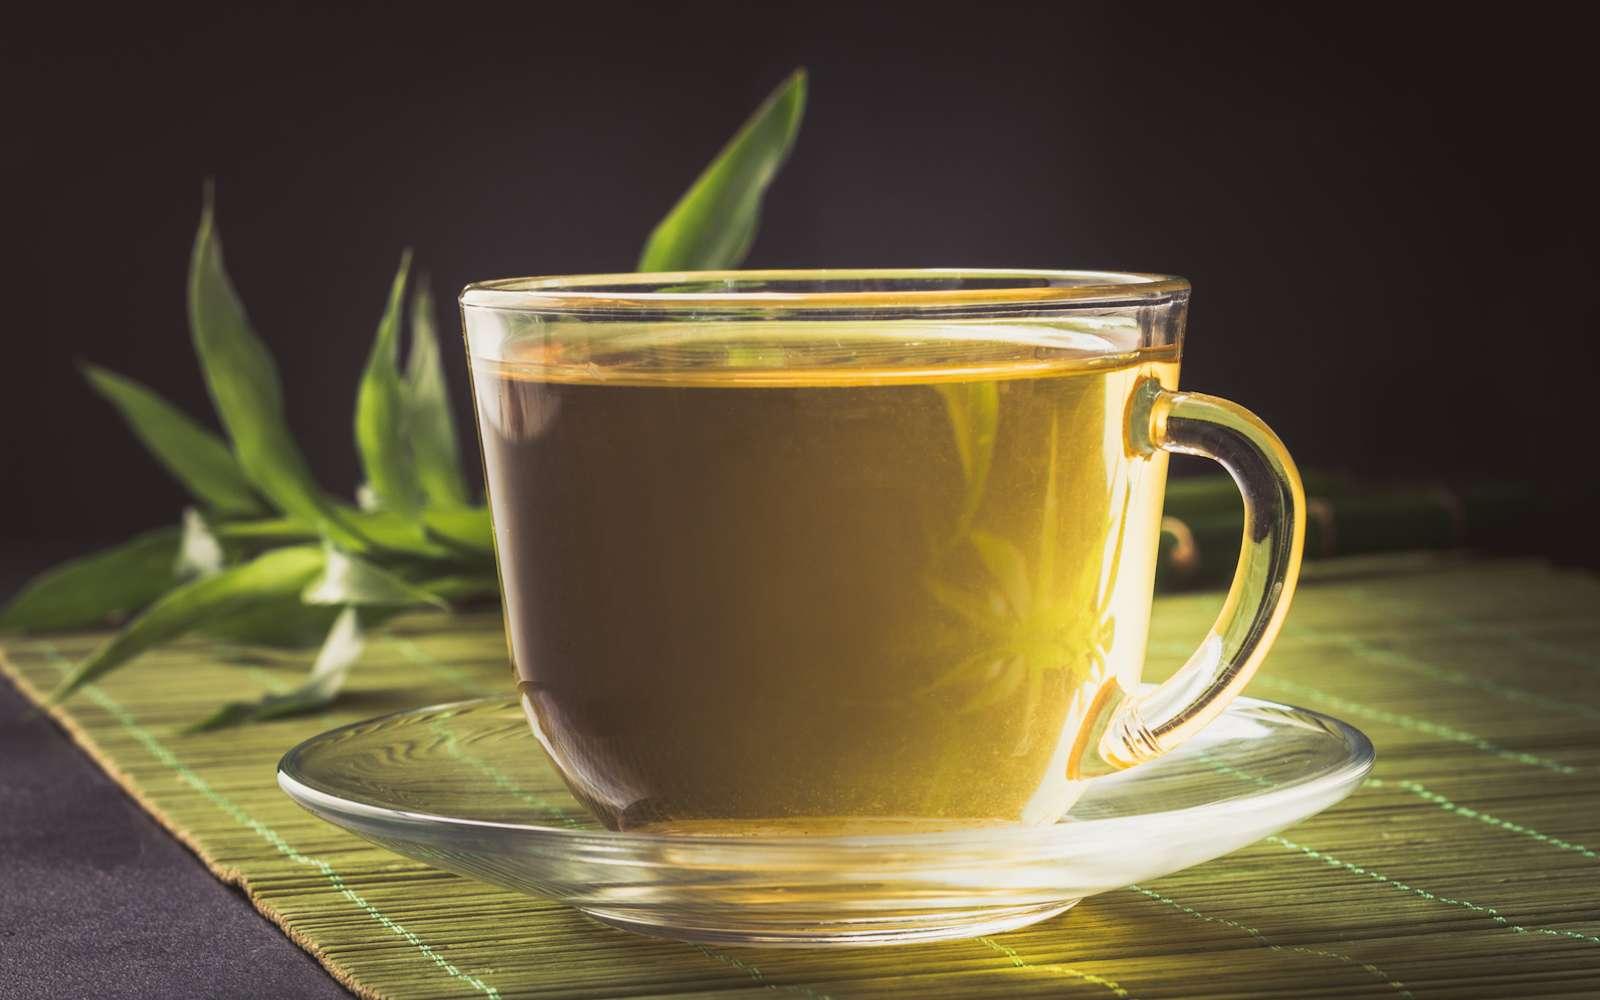 Le thé sans théine existe : c'est le hongyacha. © svetlana_cherruty, Fotolia